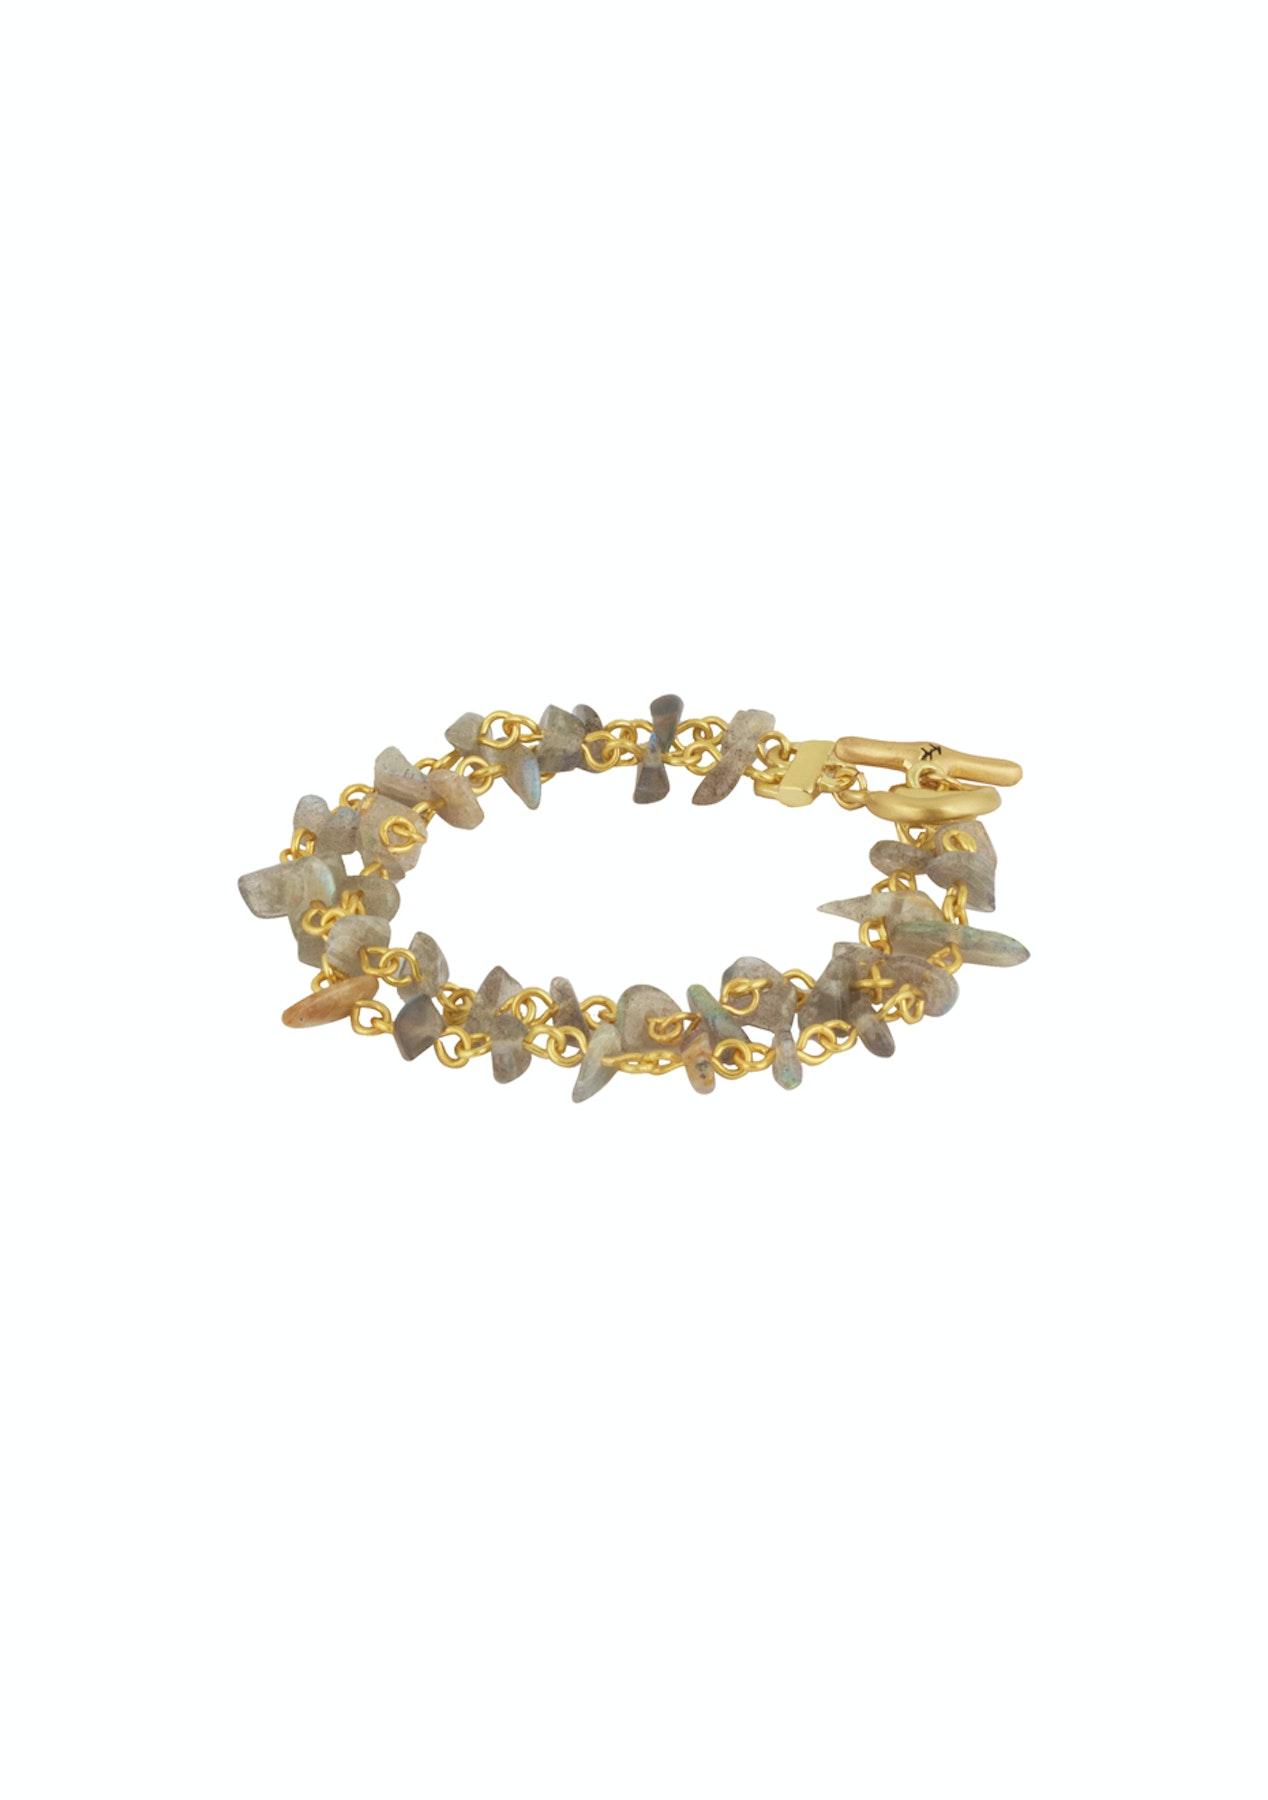 3f1231e79621 Karen Kane - Stone Bracelet - Karen Kane Jewellery Clearance - Onceit